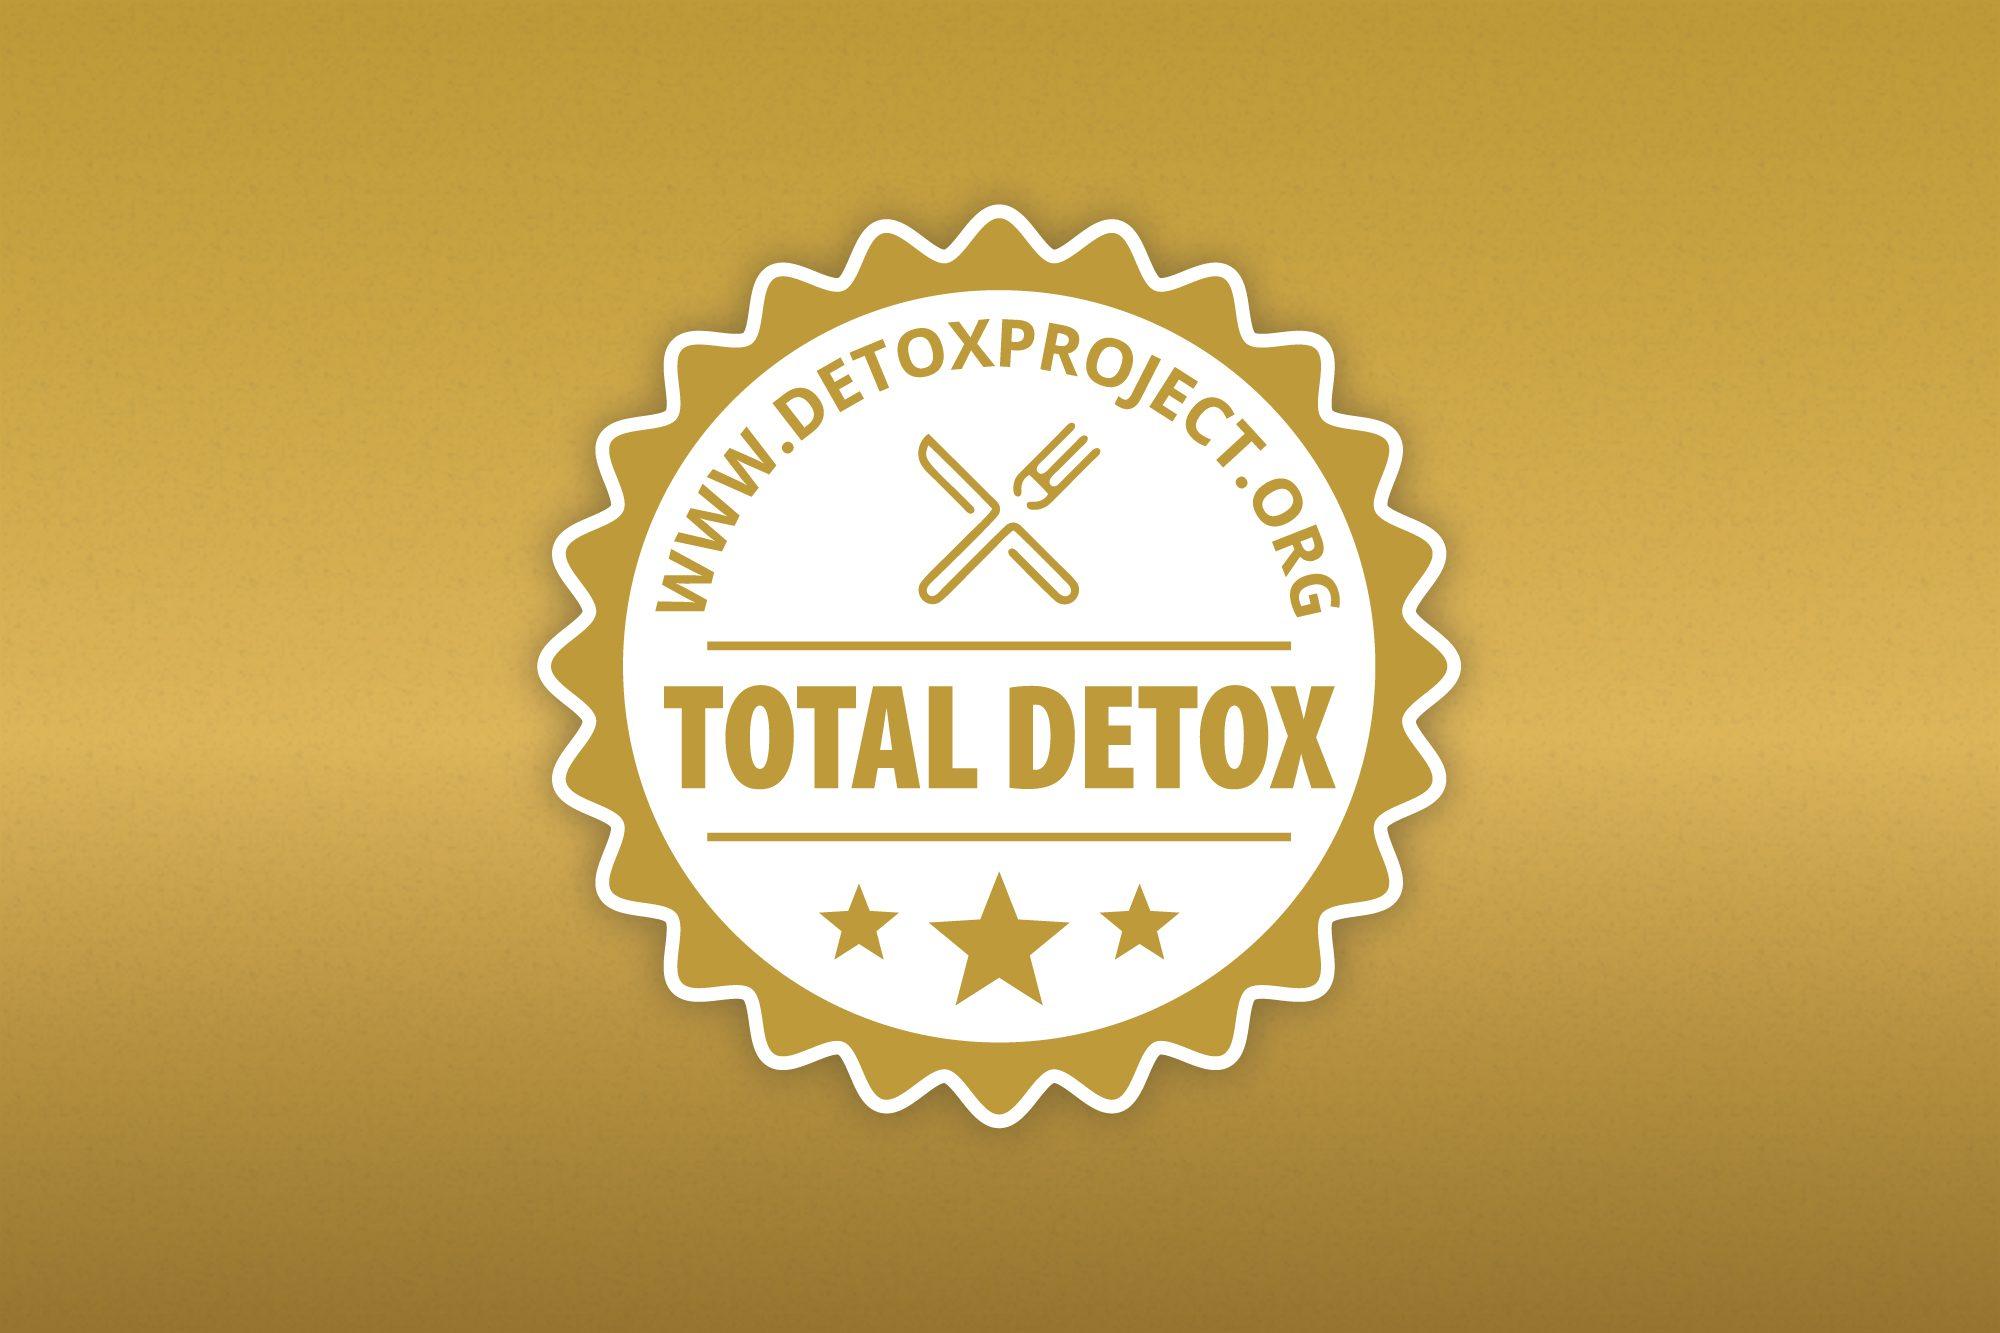 Biome Medic is Detox Certified!